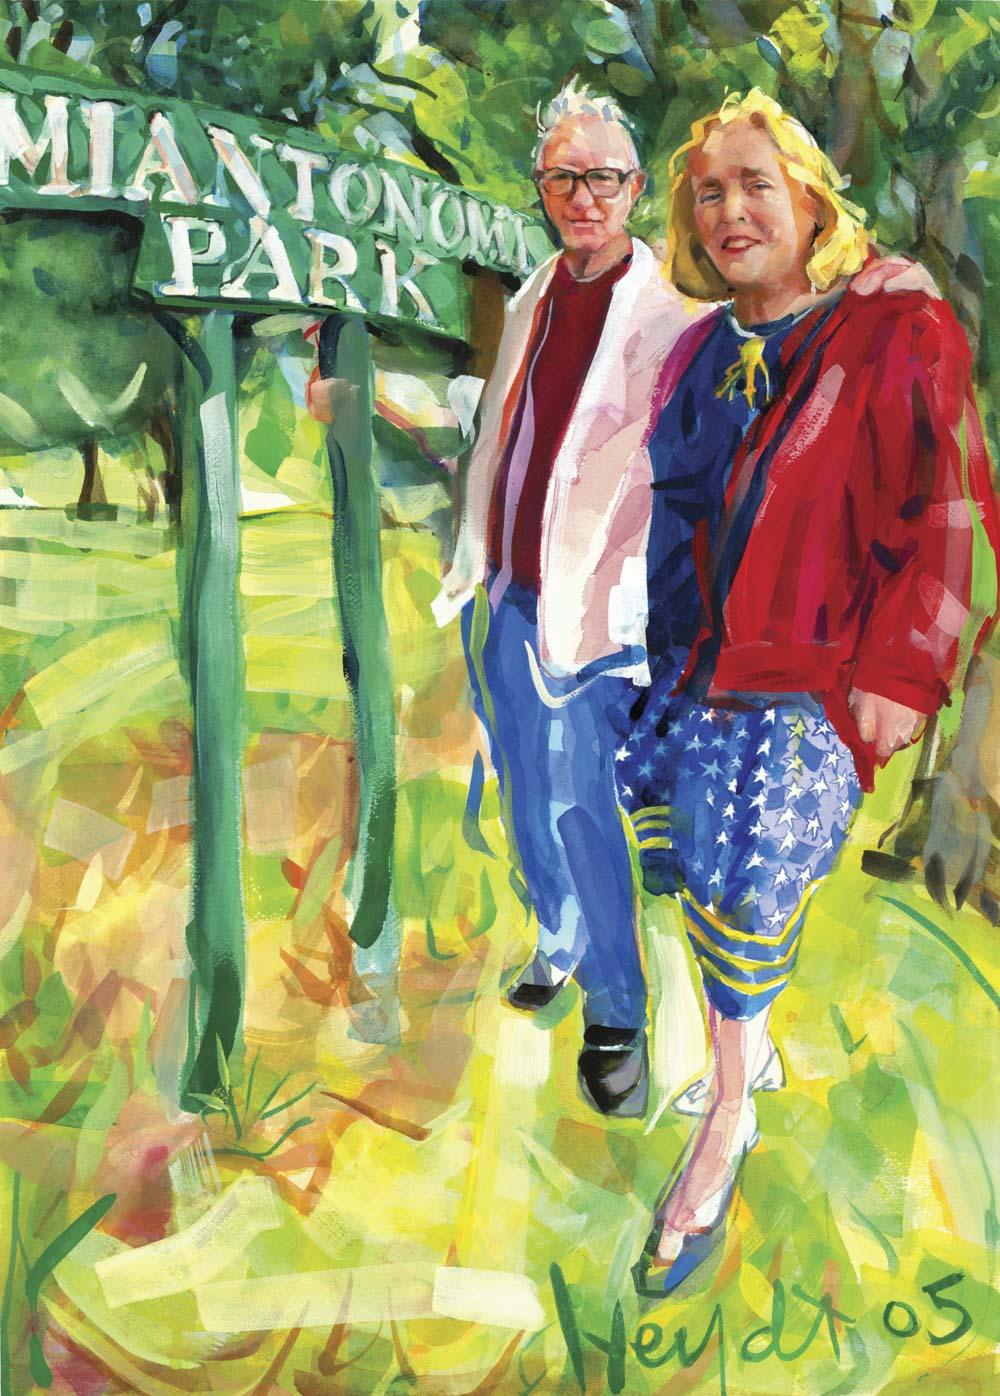 Ann and Jack Twomey, Miantonomi Park, Newport